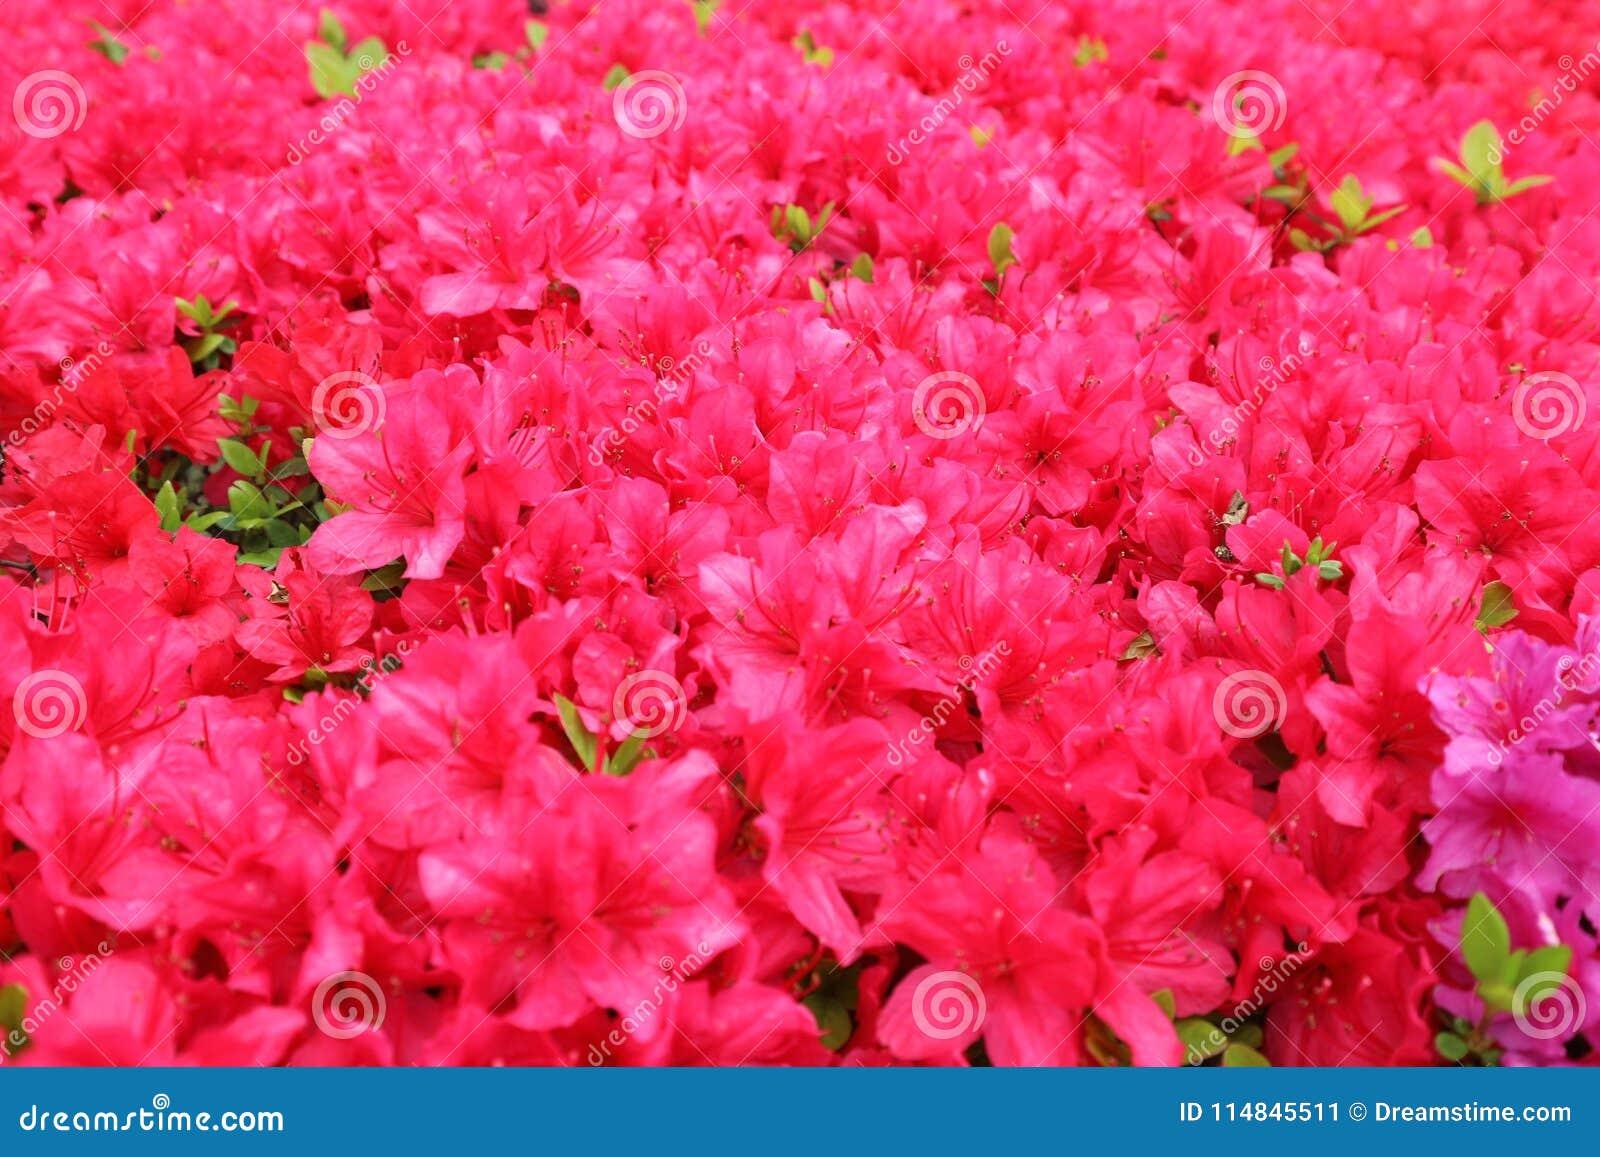 Dark Pink Flowers Plenty Blooming Stock Image Image Of Japanese